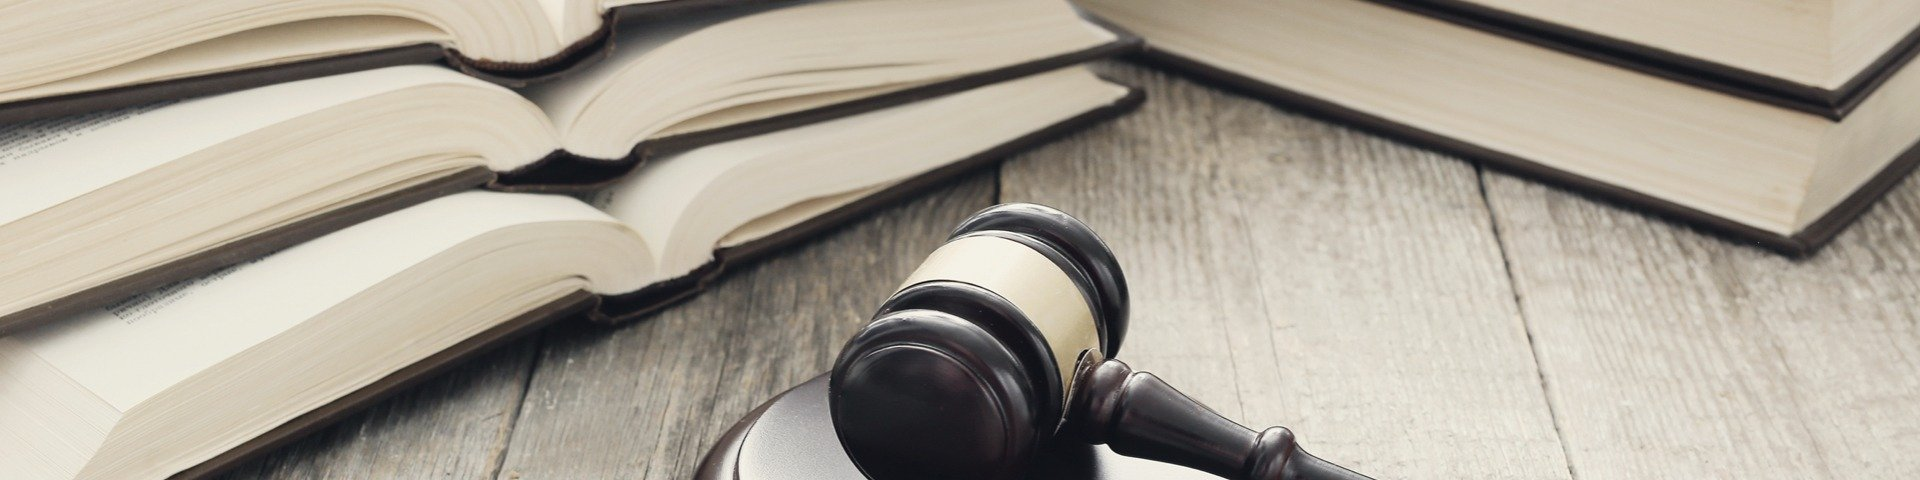 Congresso Nacional analisa proposta que muda regras no pagamento de precatórios